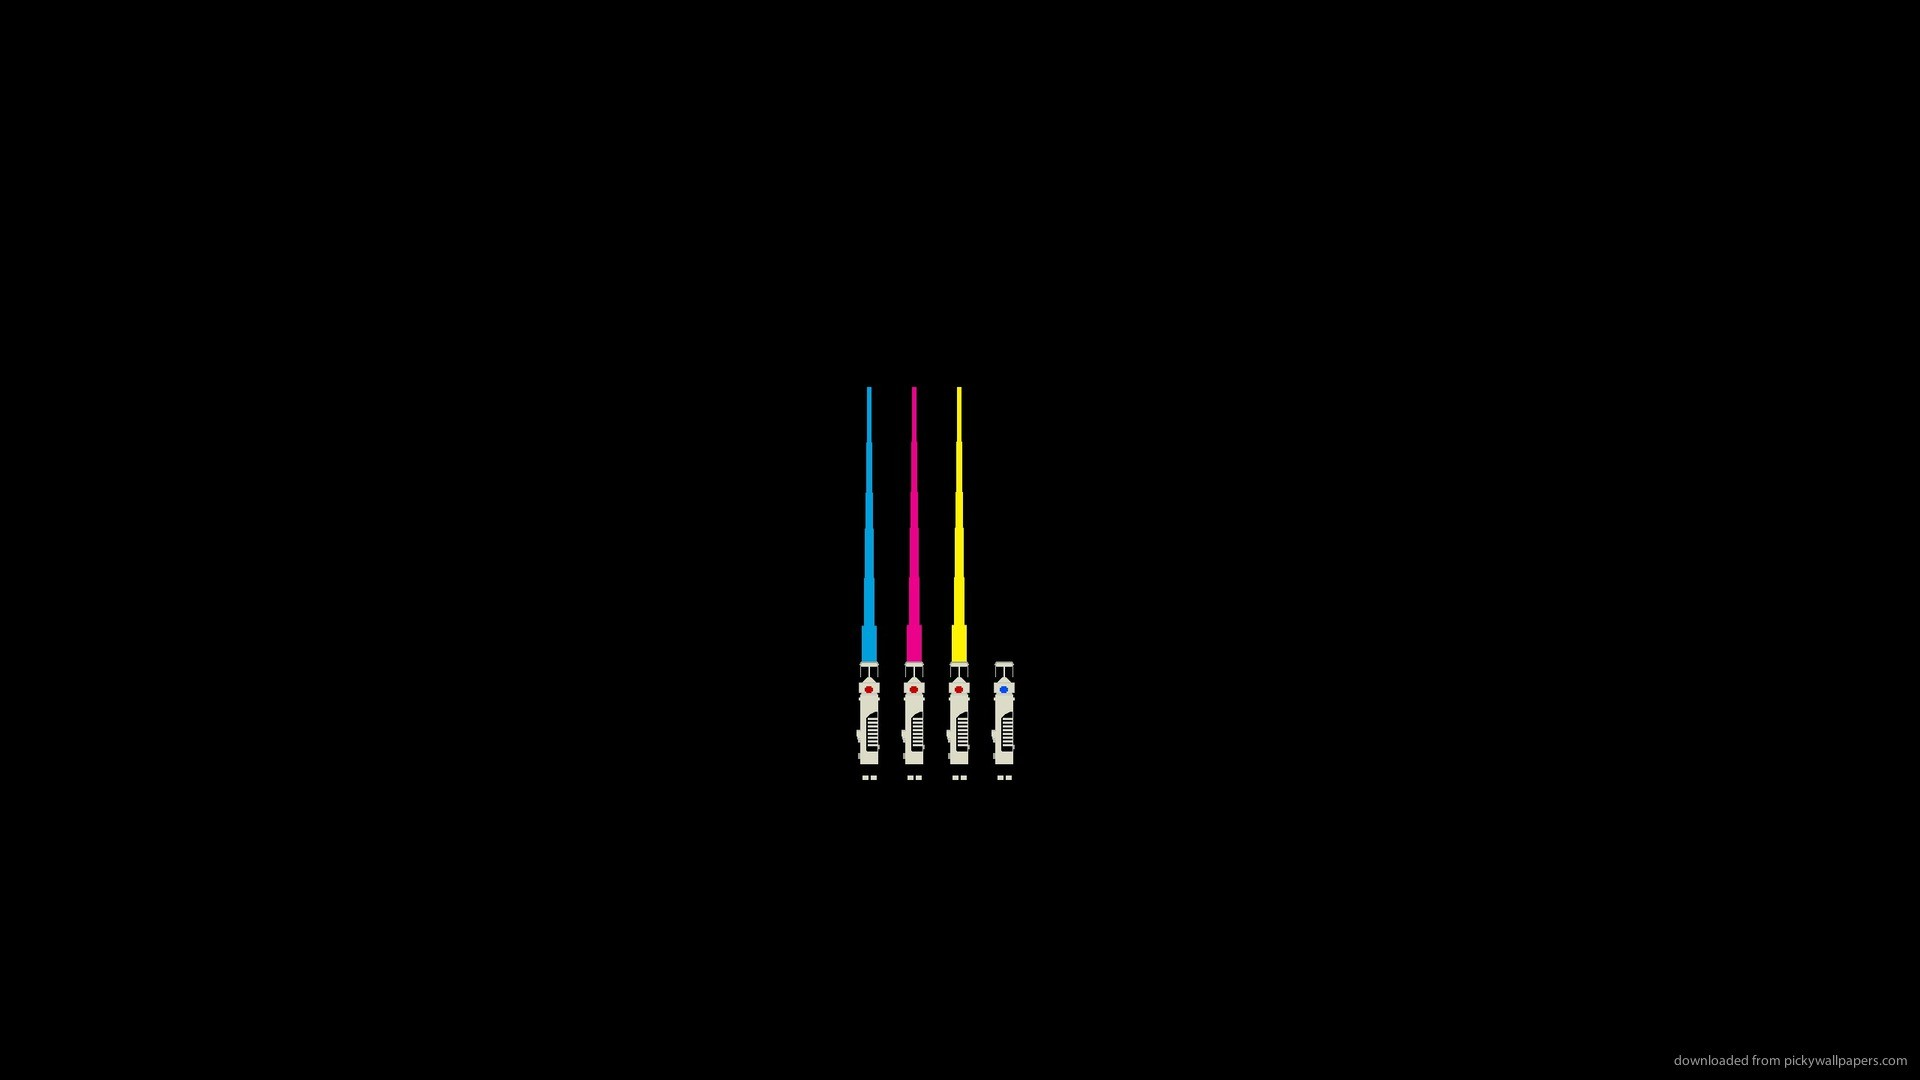 Lightsaber HD Wallpaper (80+ images)